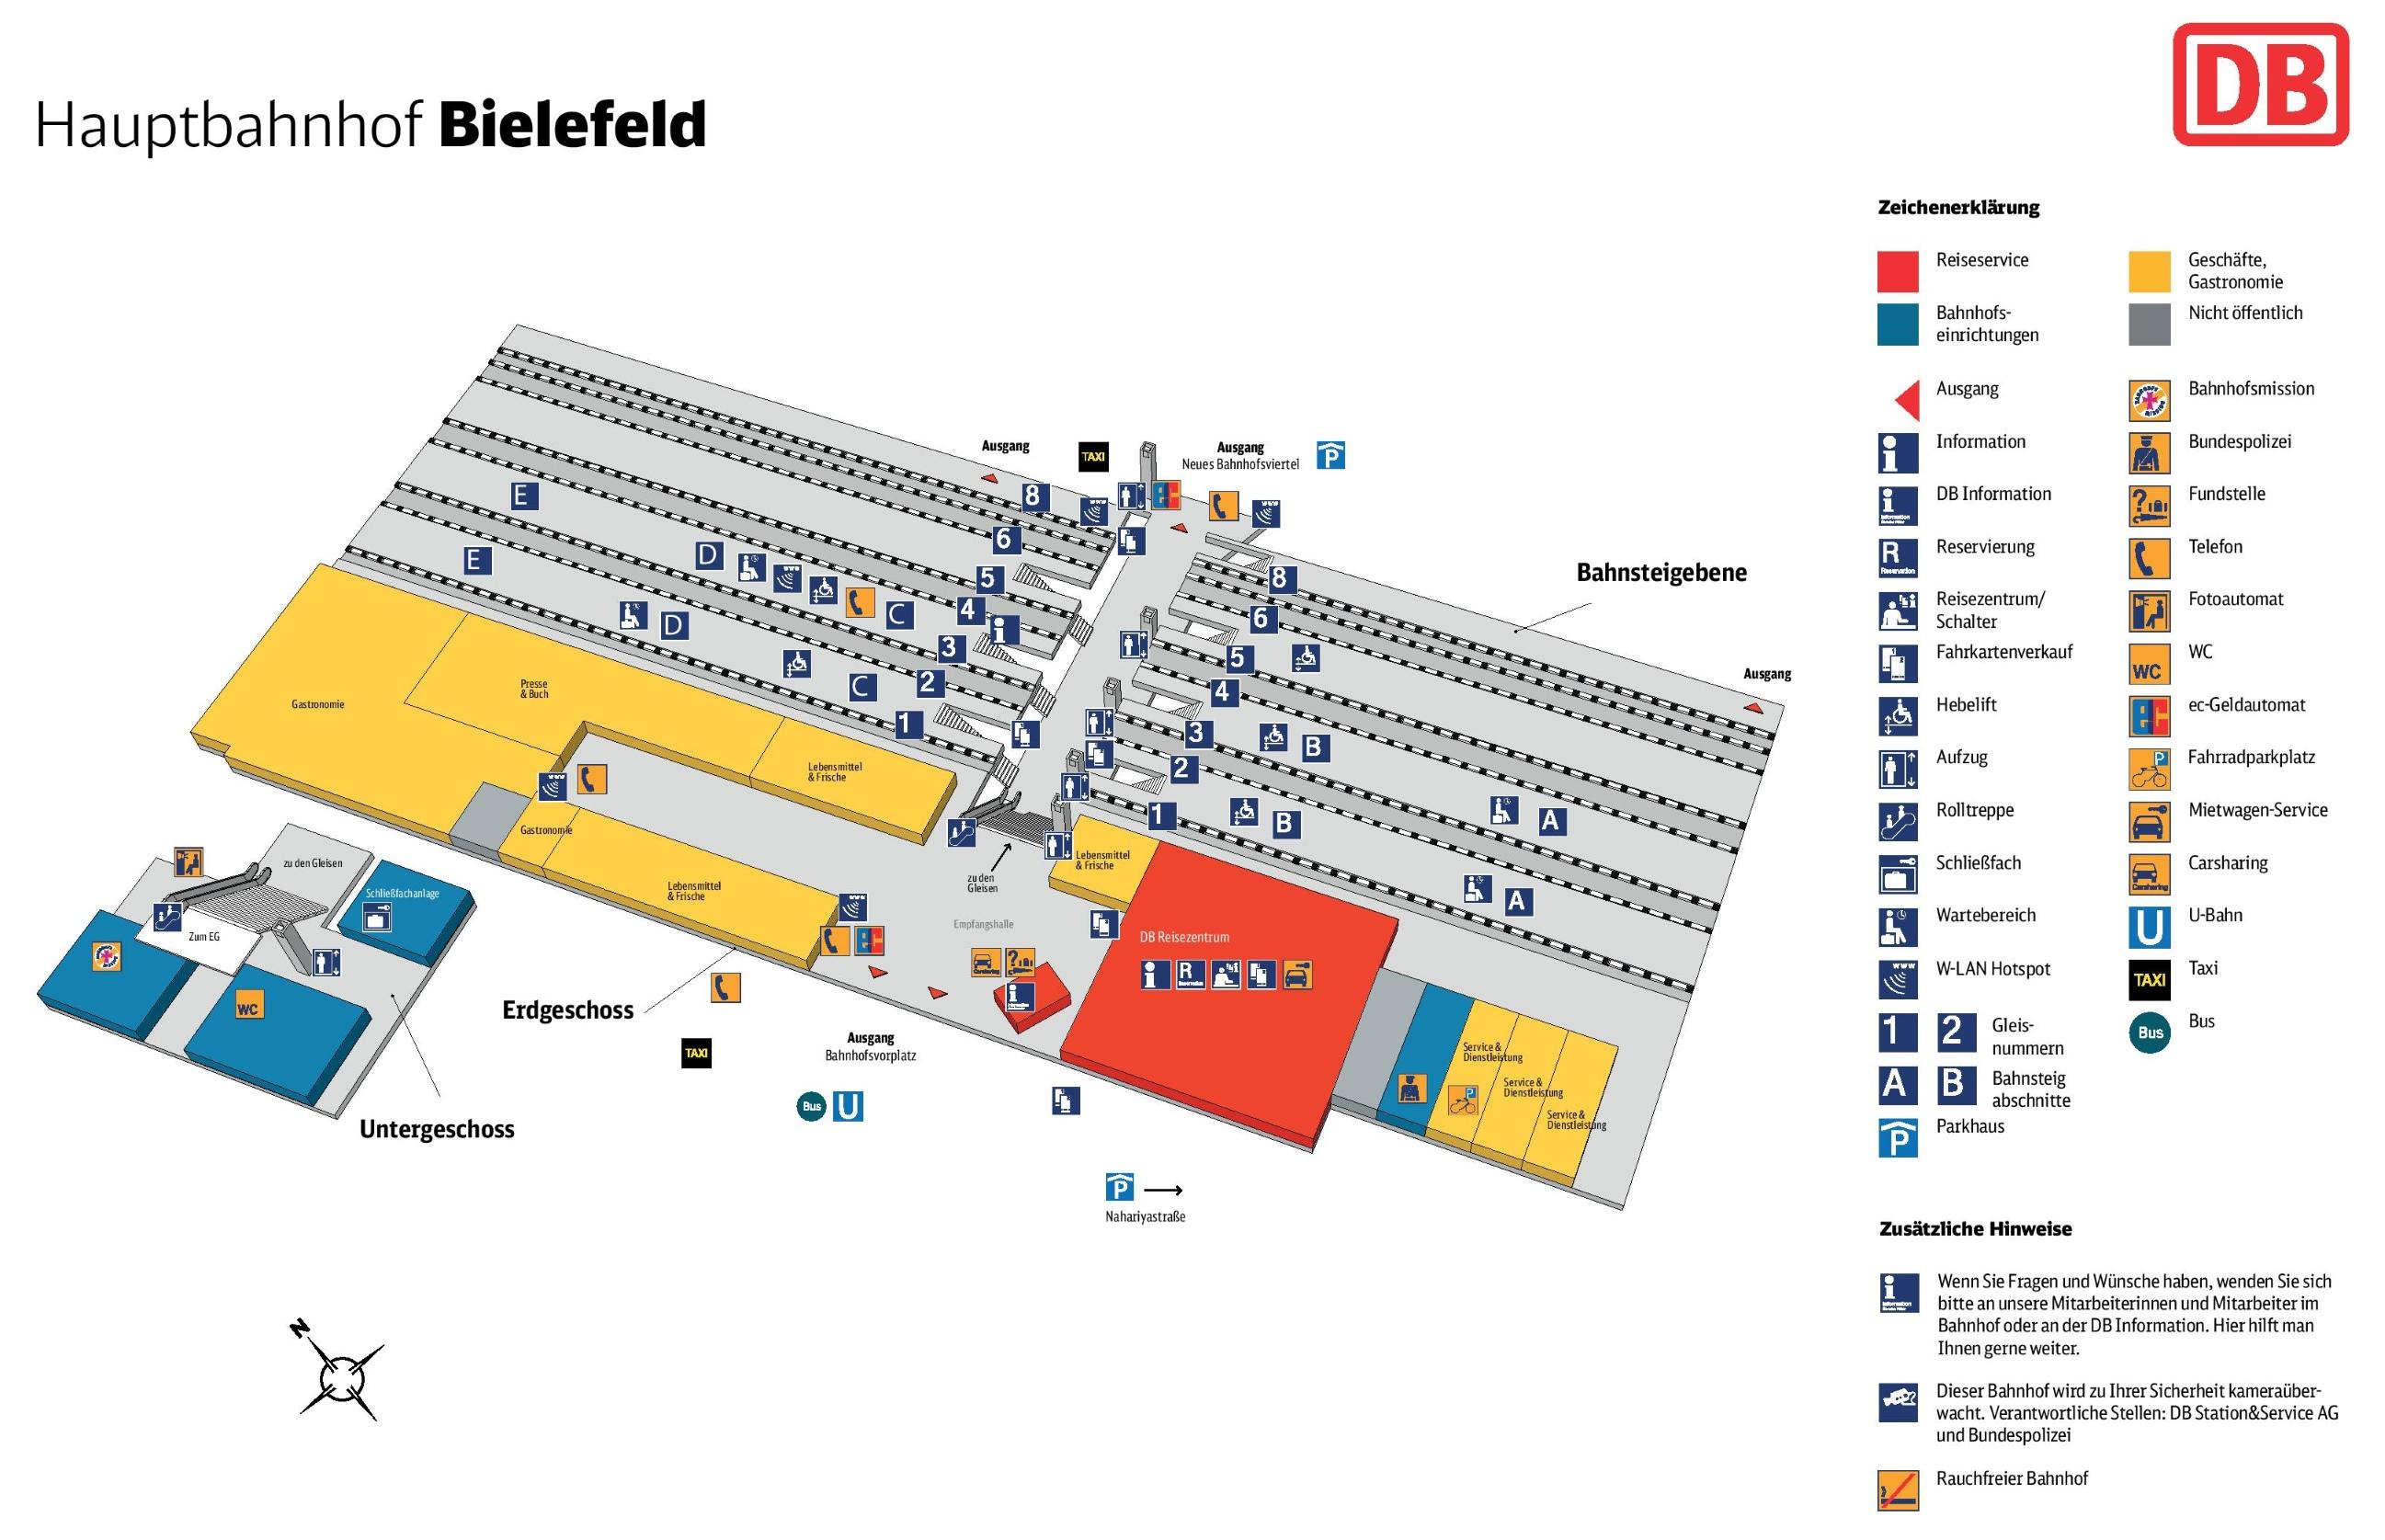 Bielefeld hauptbahnhof map railway station